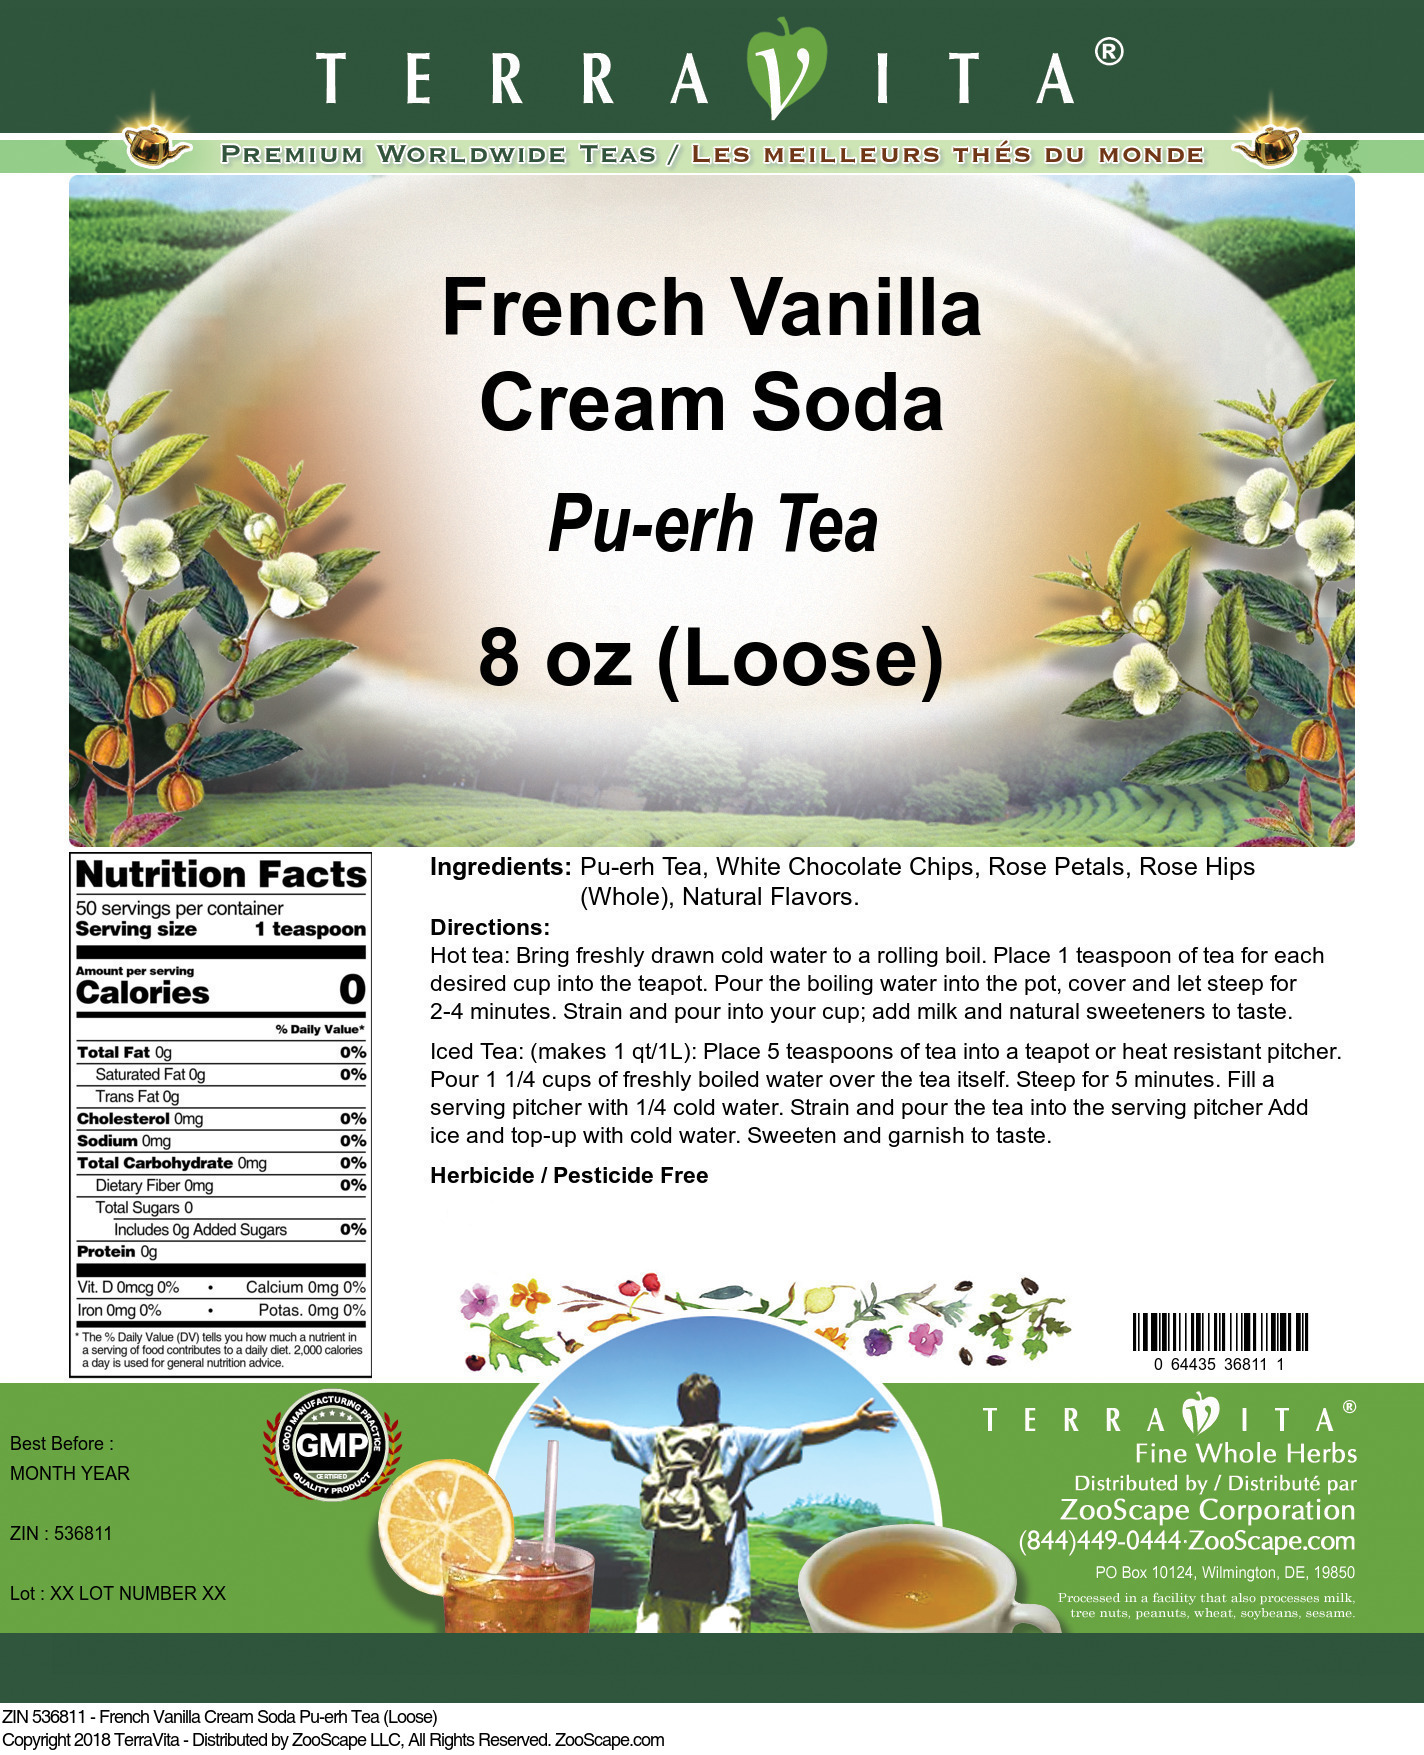 French Vanilla Cream Soda Pu-erh Tea